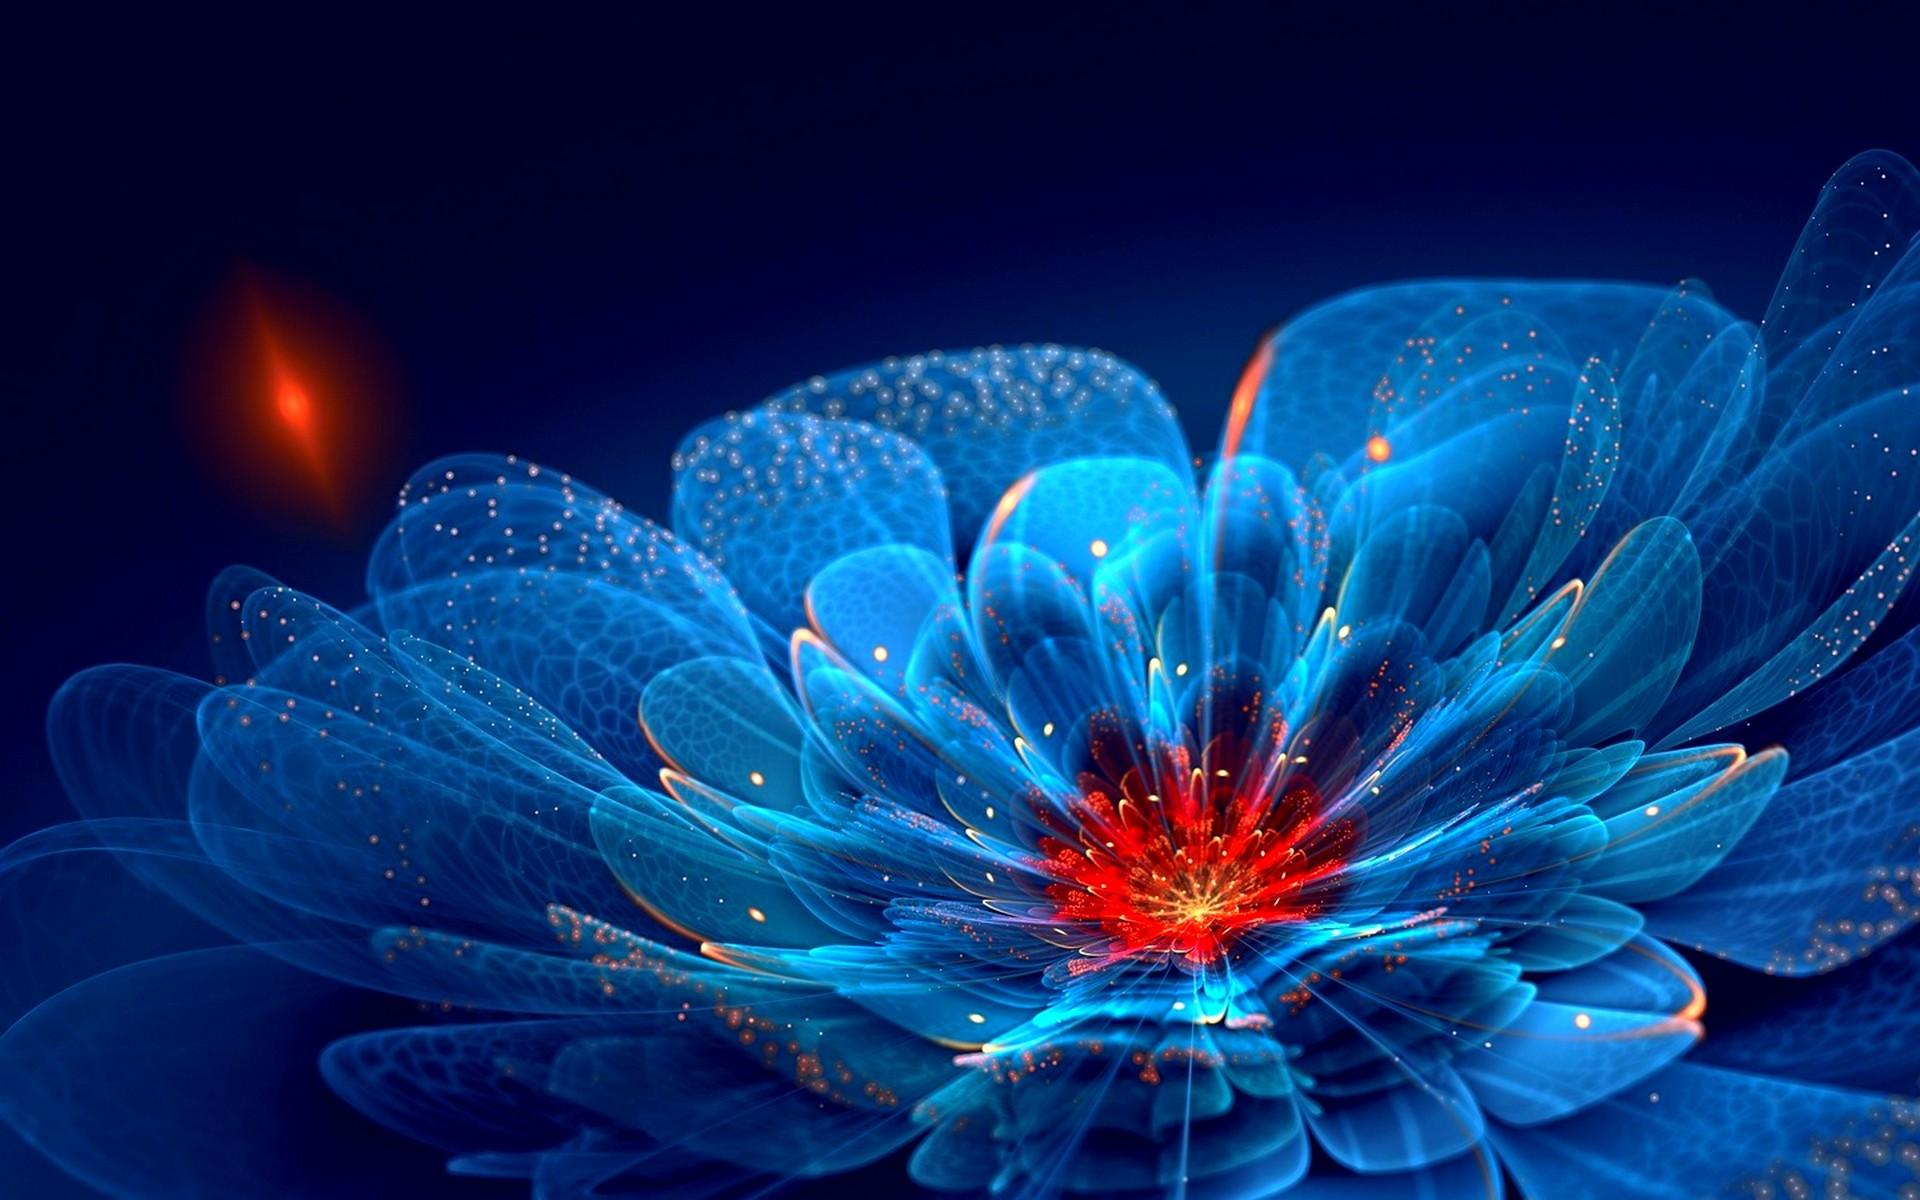 Cool Neon Flowers Wallpaper